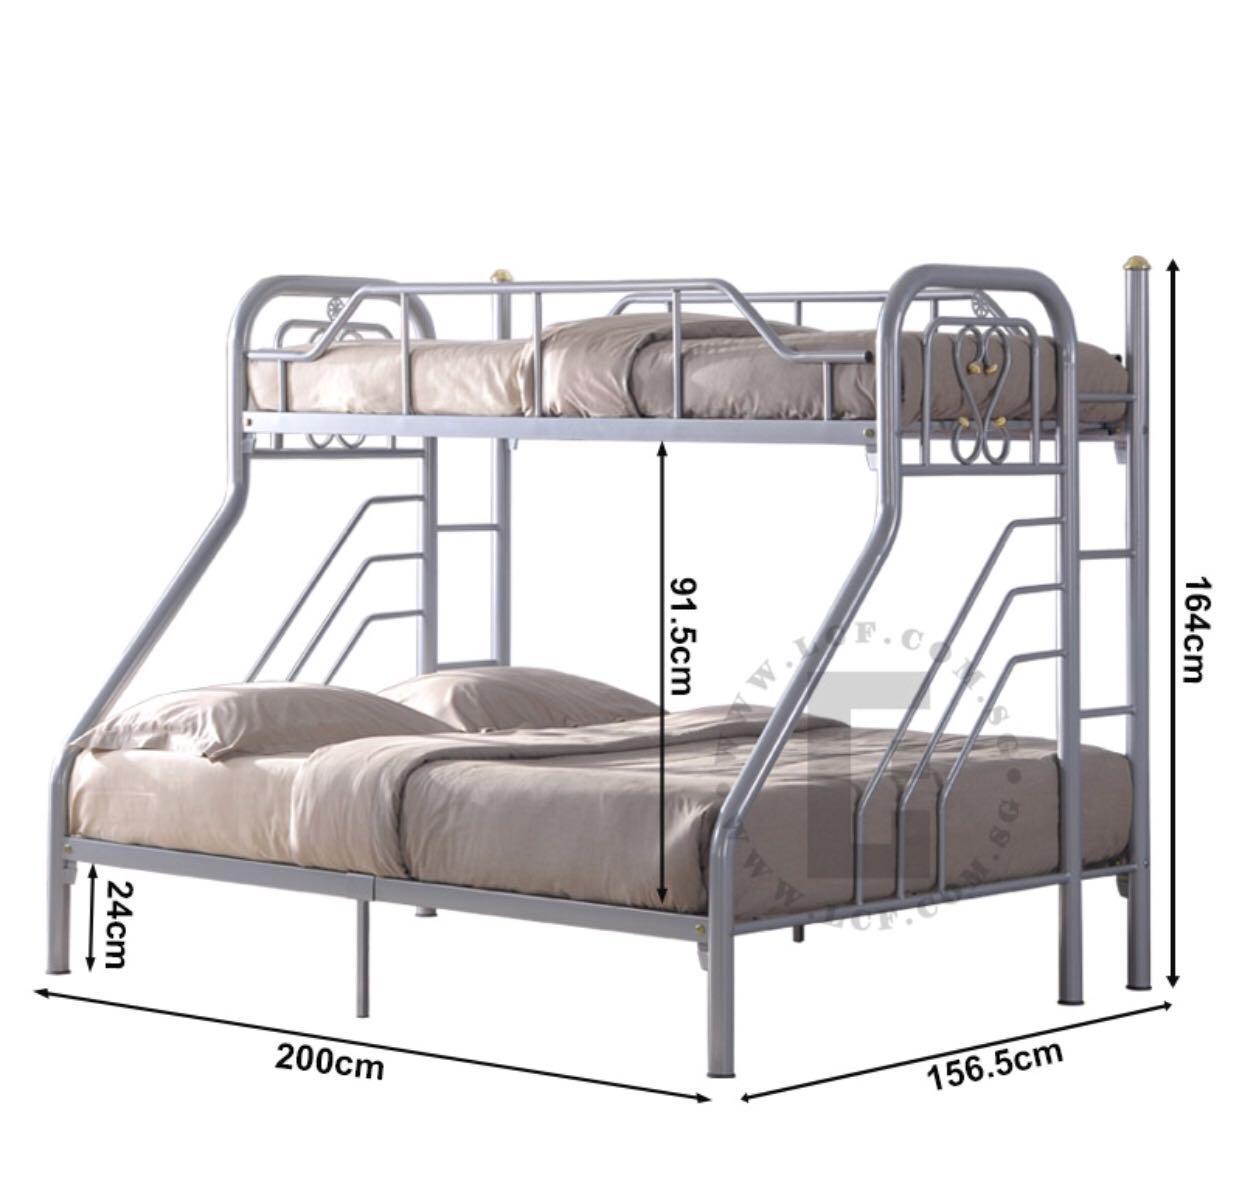 Double Bunk Bed Frame ( No Mattress )